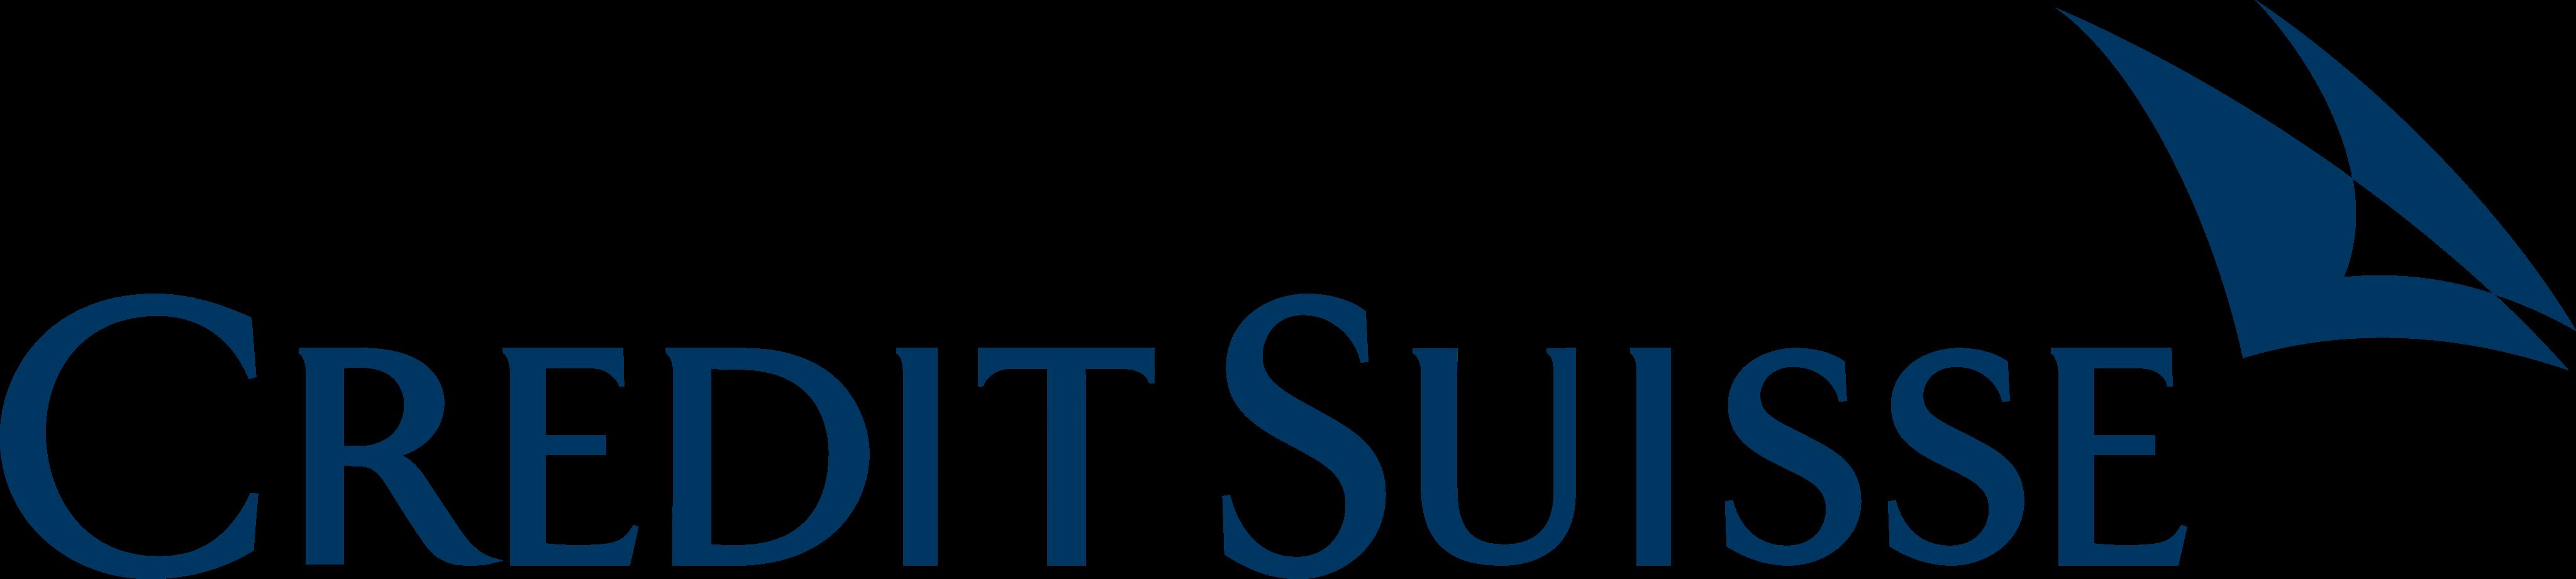 credt suisse logo - Credit Suisse Logo